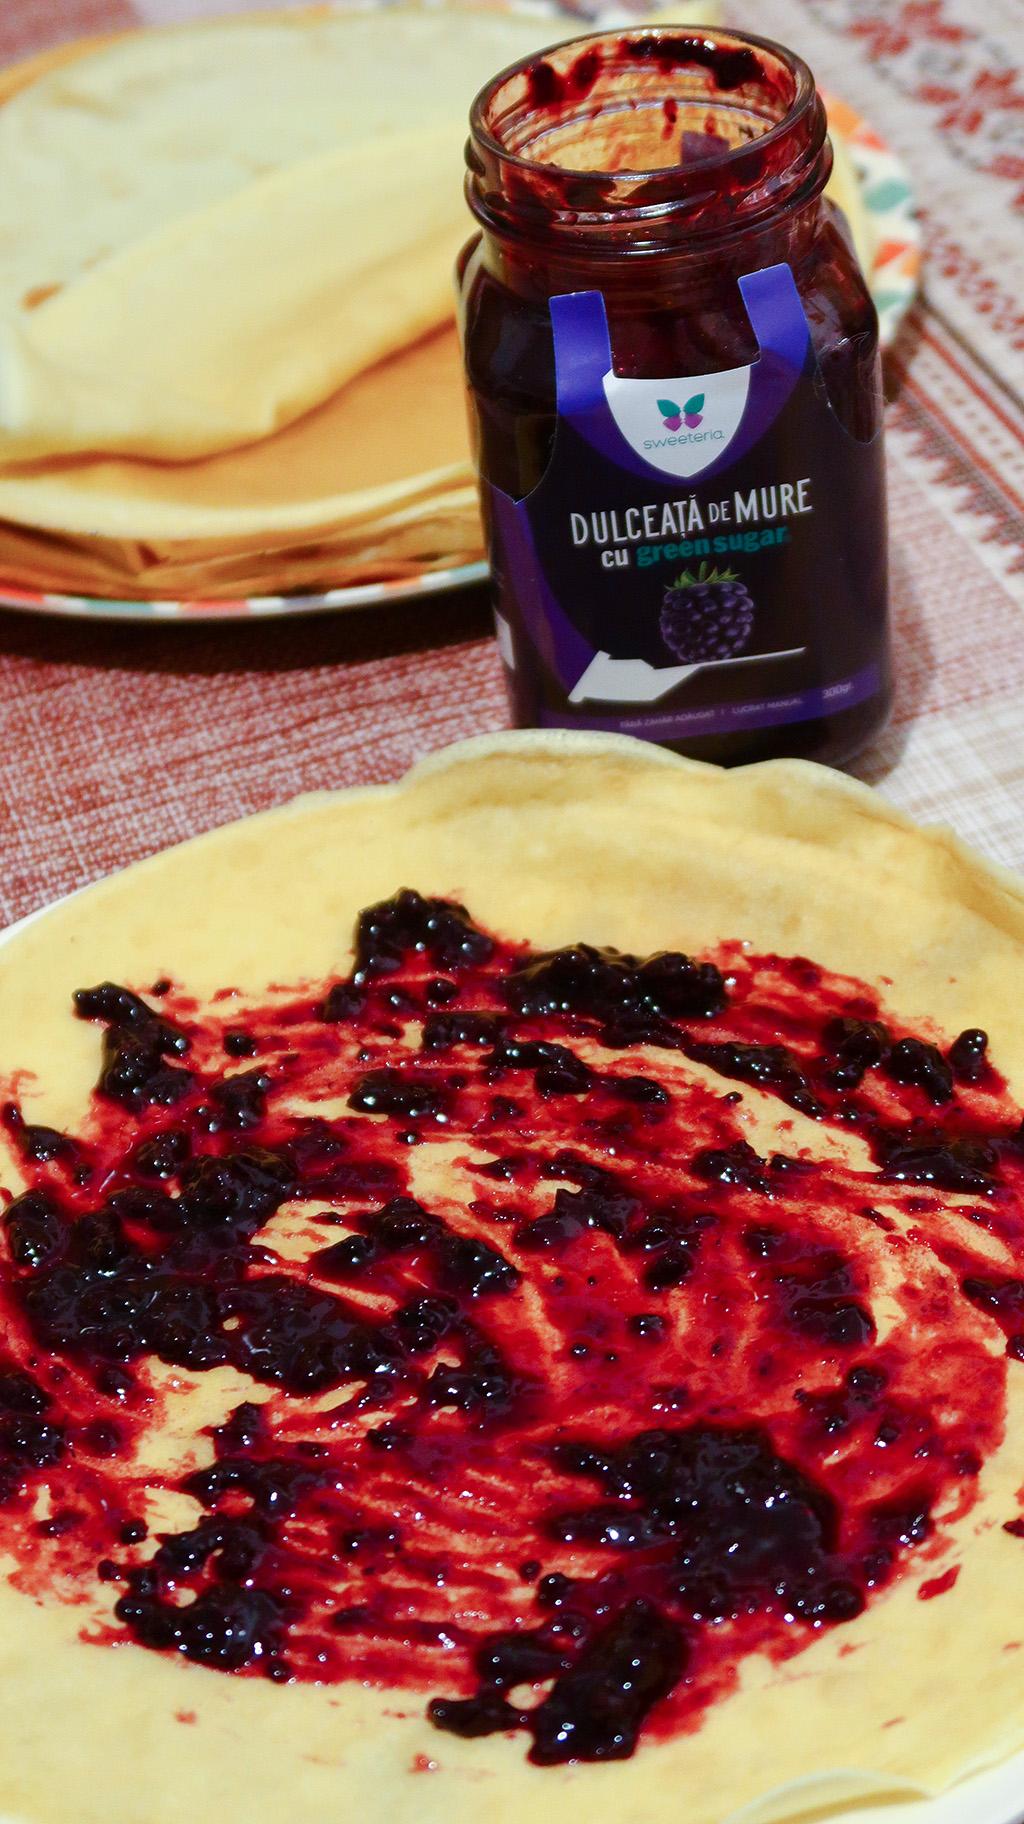 clatite mic dejun delicios sweeteria batoane musli napolitane dulceata mure unt arahite natural bio fara zahar cereale